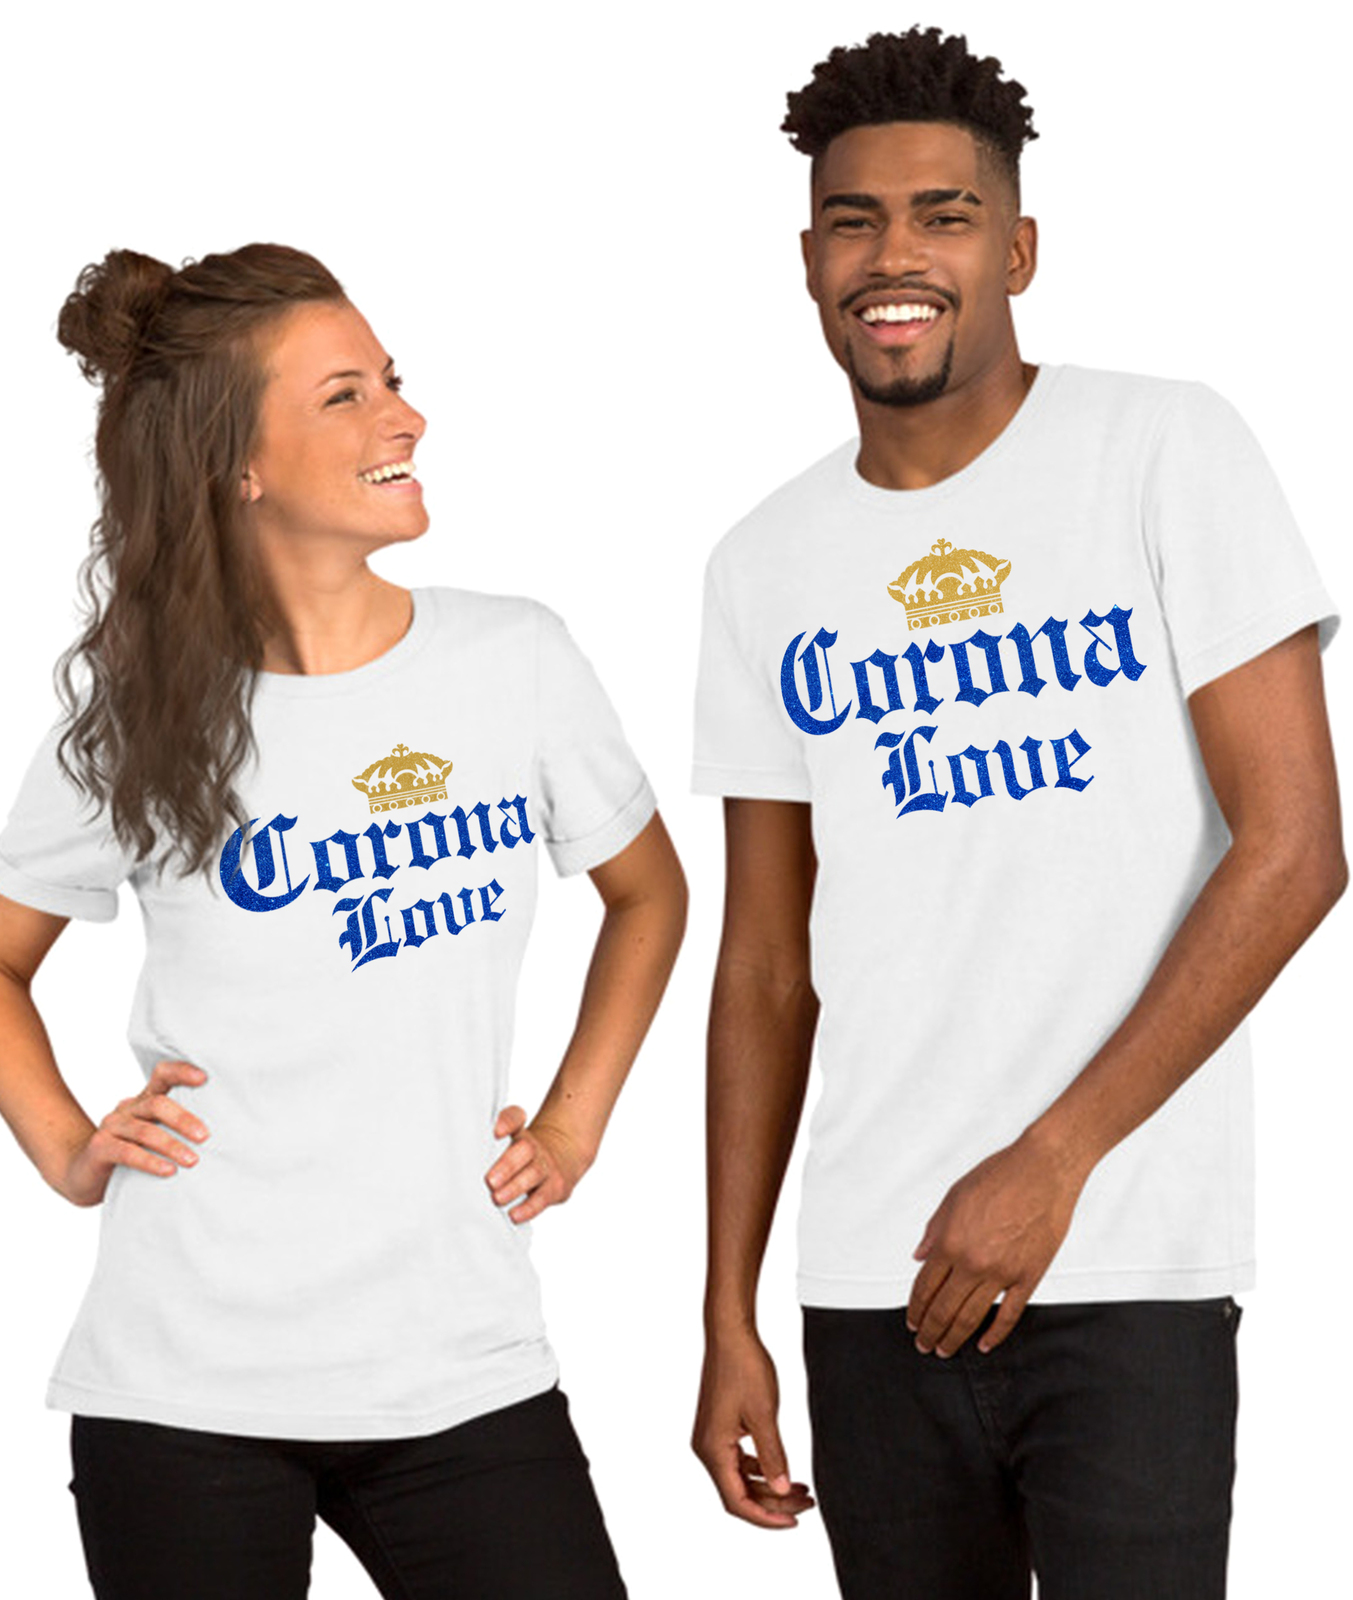 corona love Corona extra Bottle beer T Shirt, cinco de mayo party tee shirt image 3